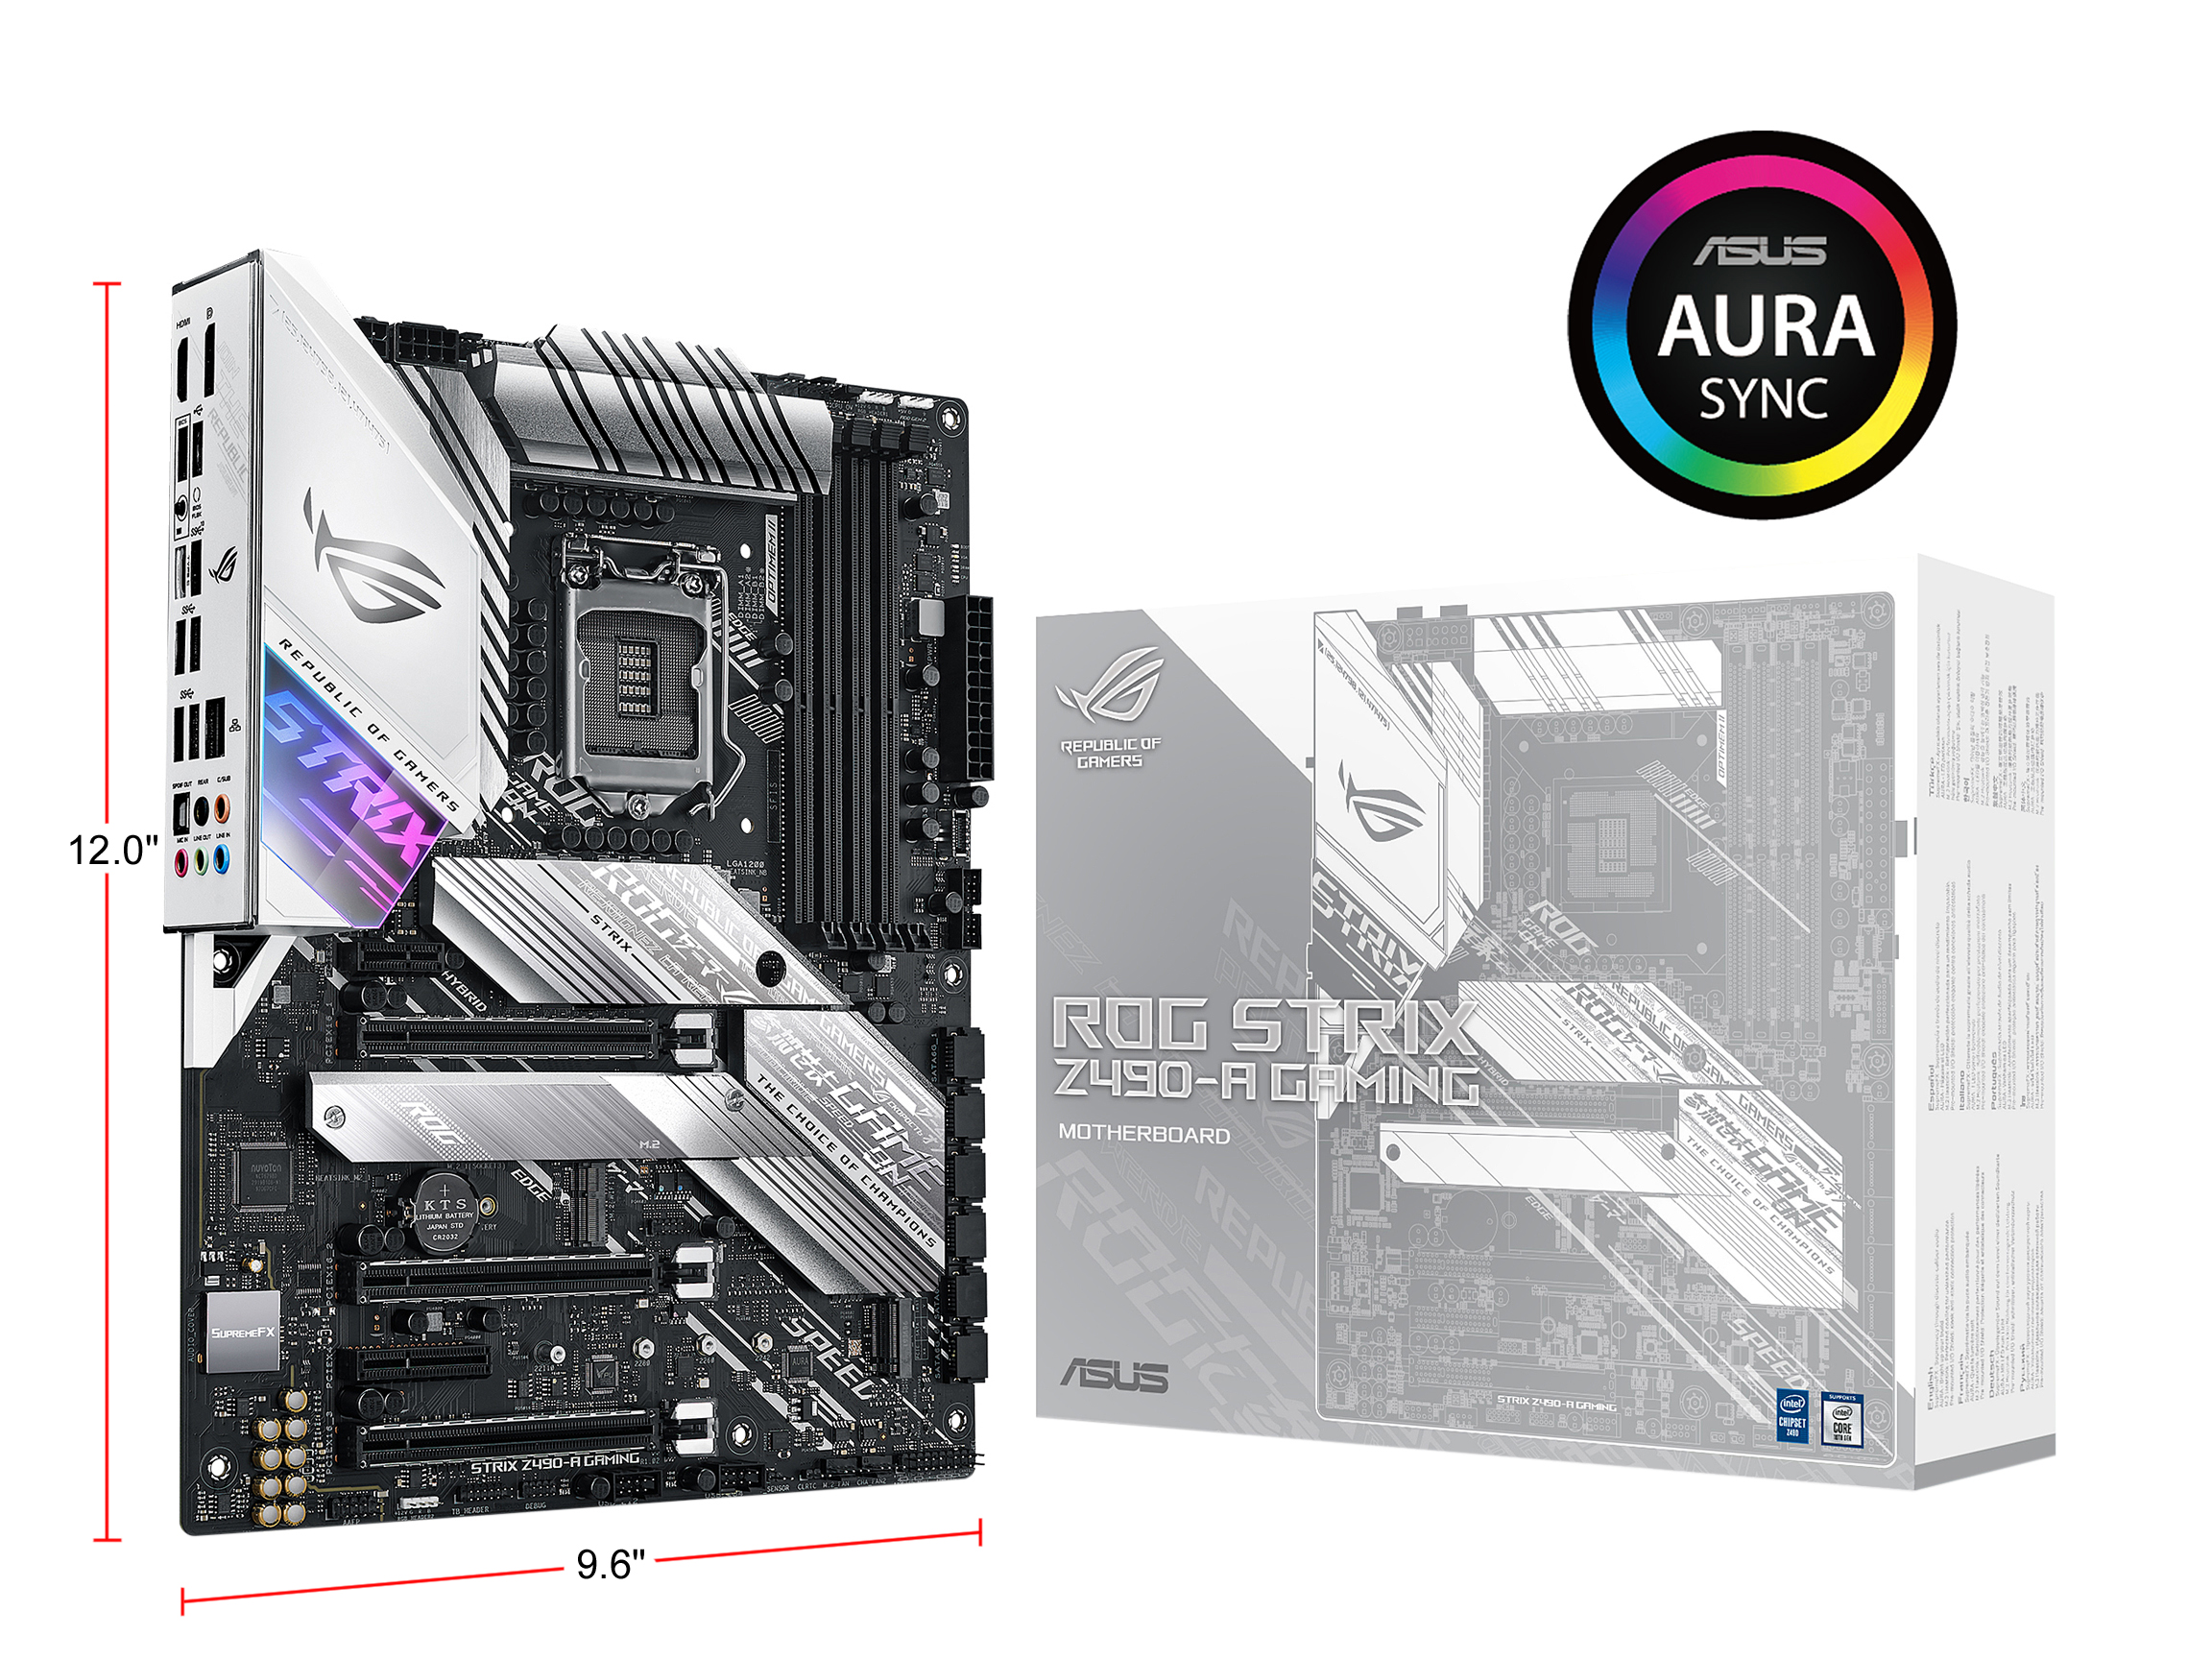 ASUS ROG STRIX Z490-A GAMING Motherboard